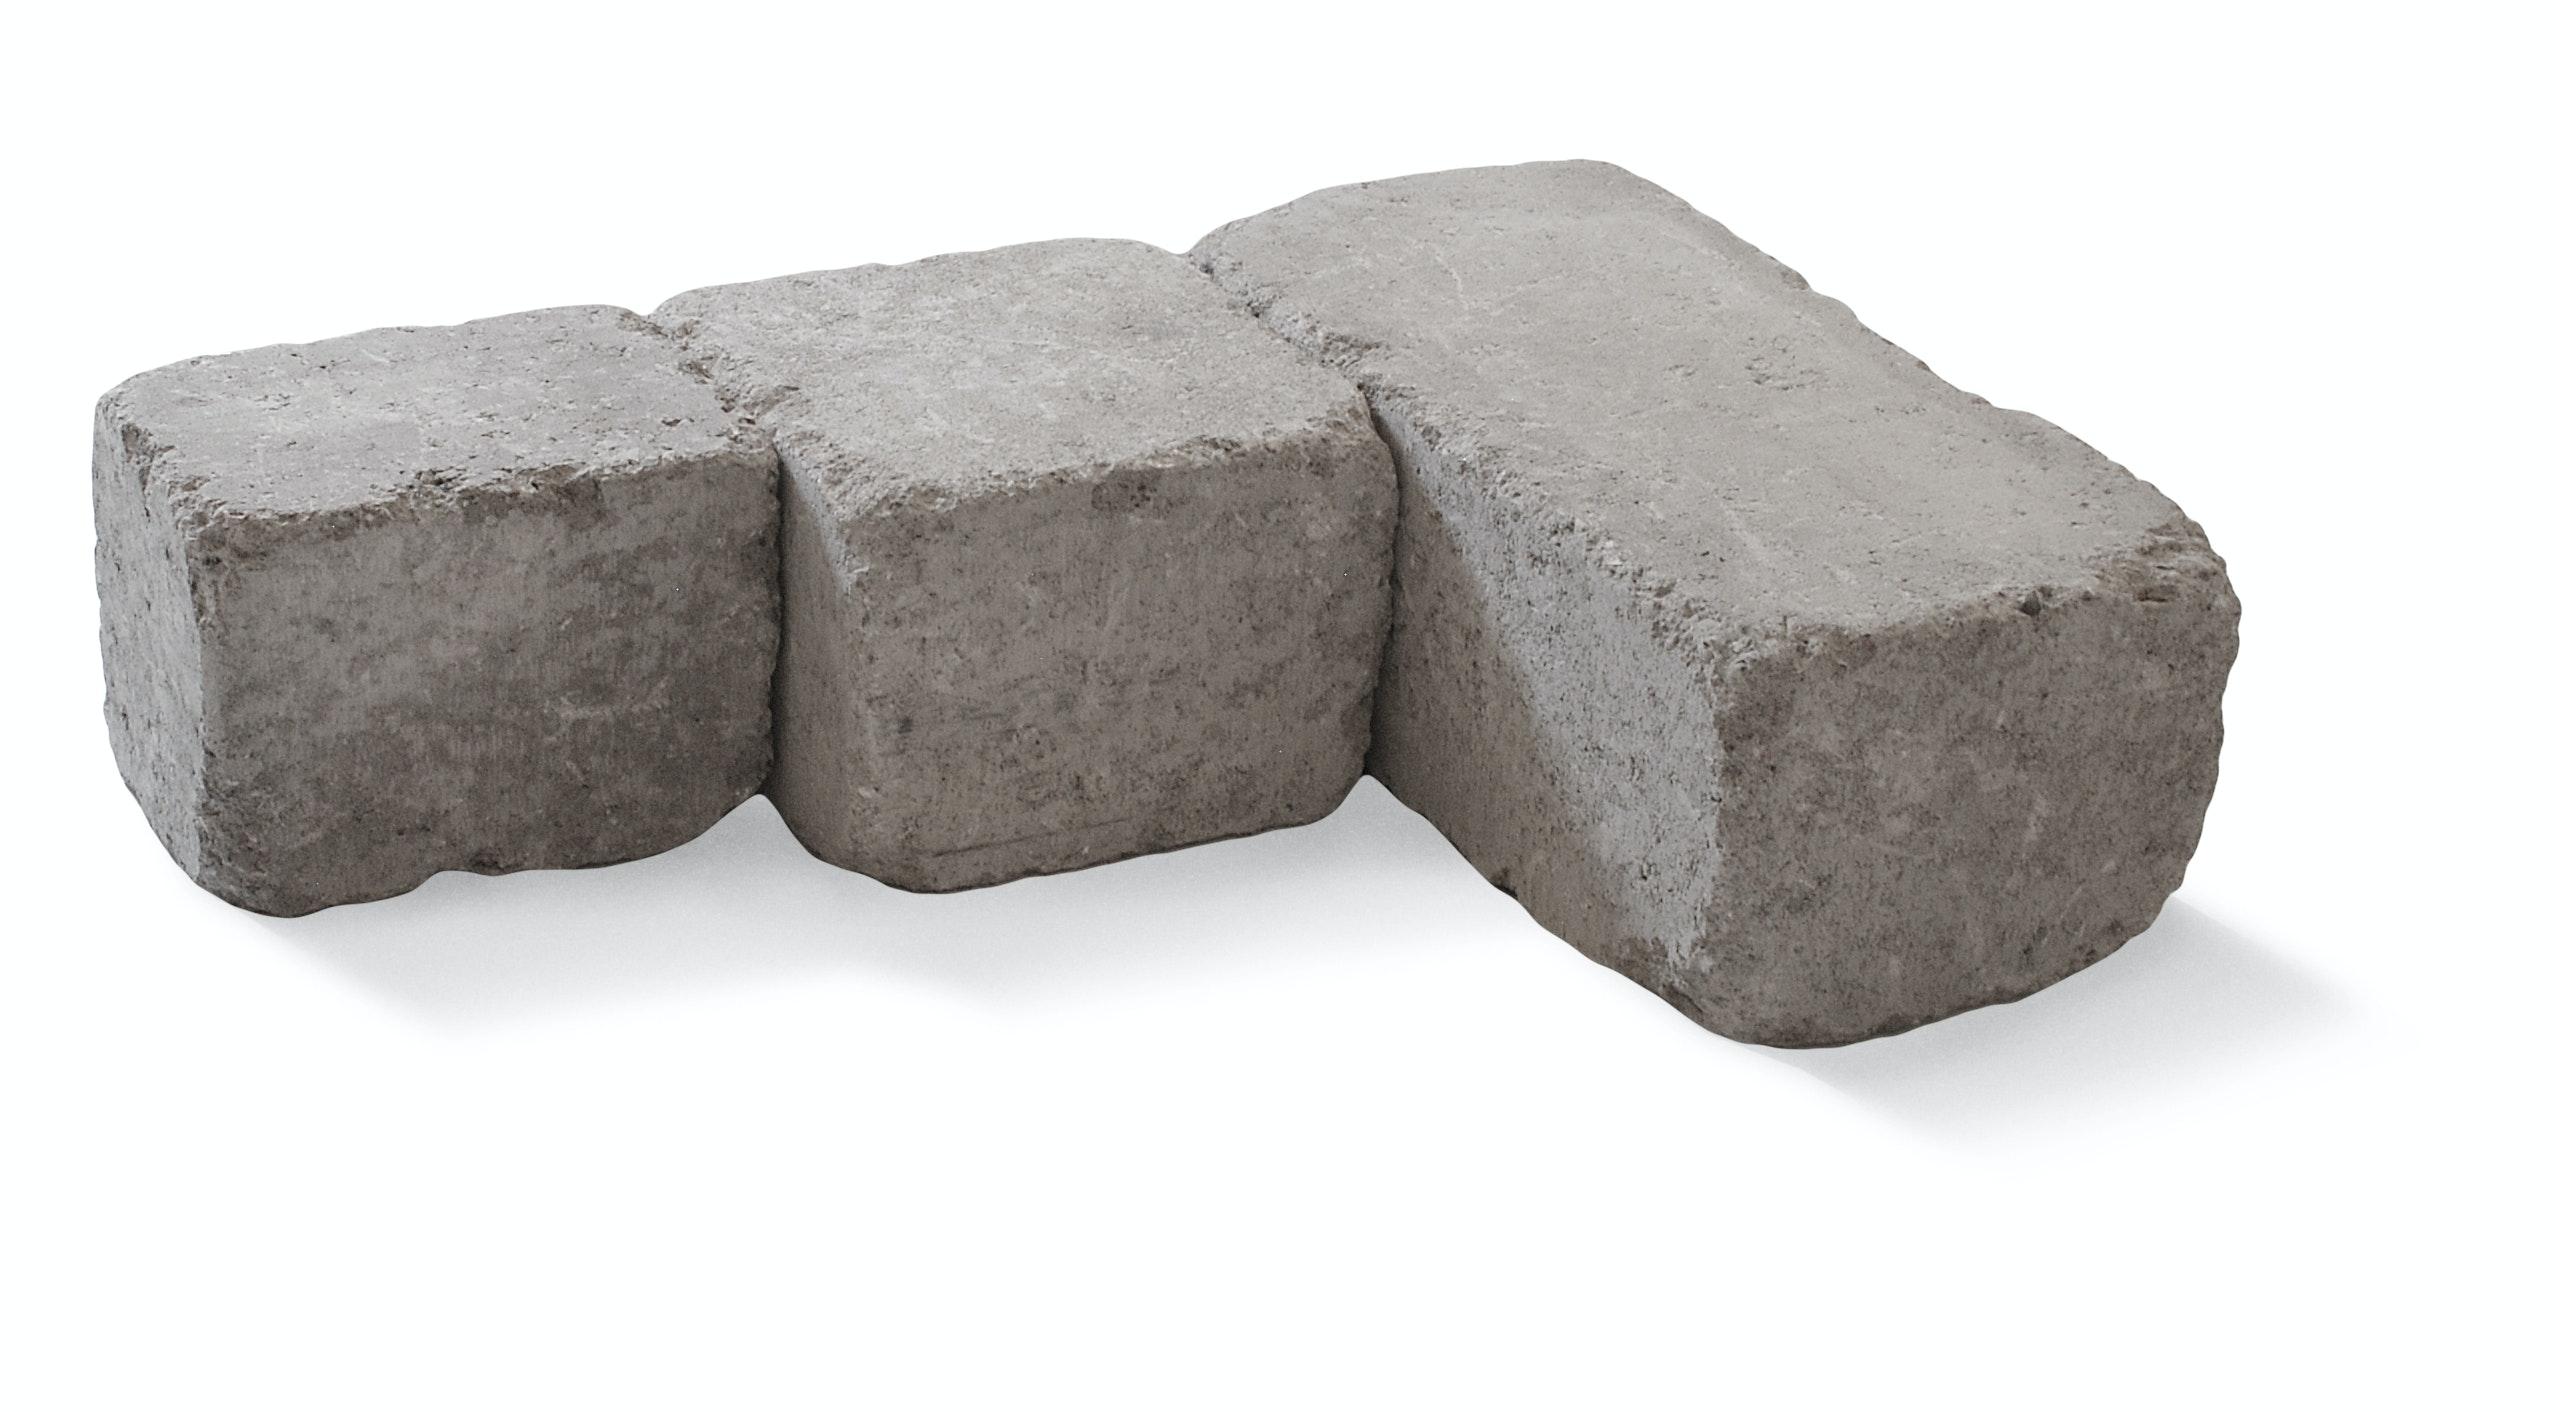 Mursten S:t Eriks Block Rustik Antracit 39x19x13,8cm